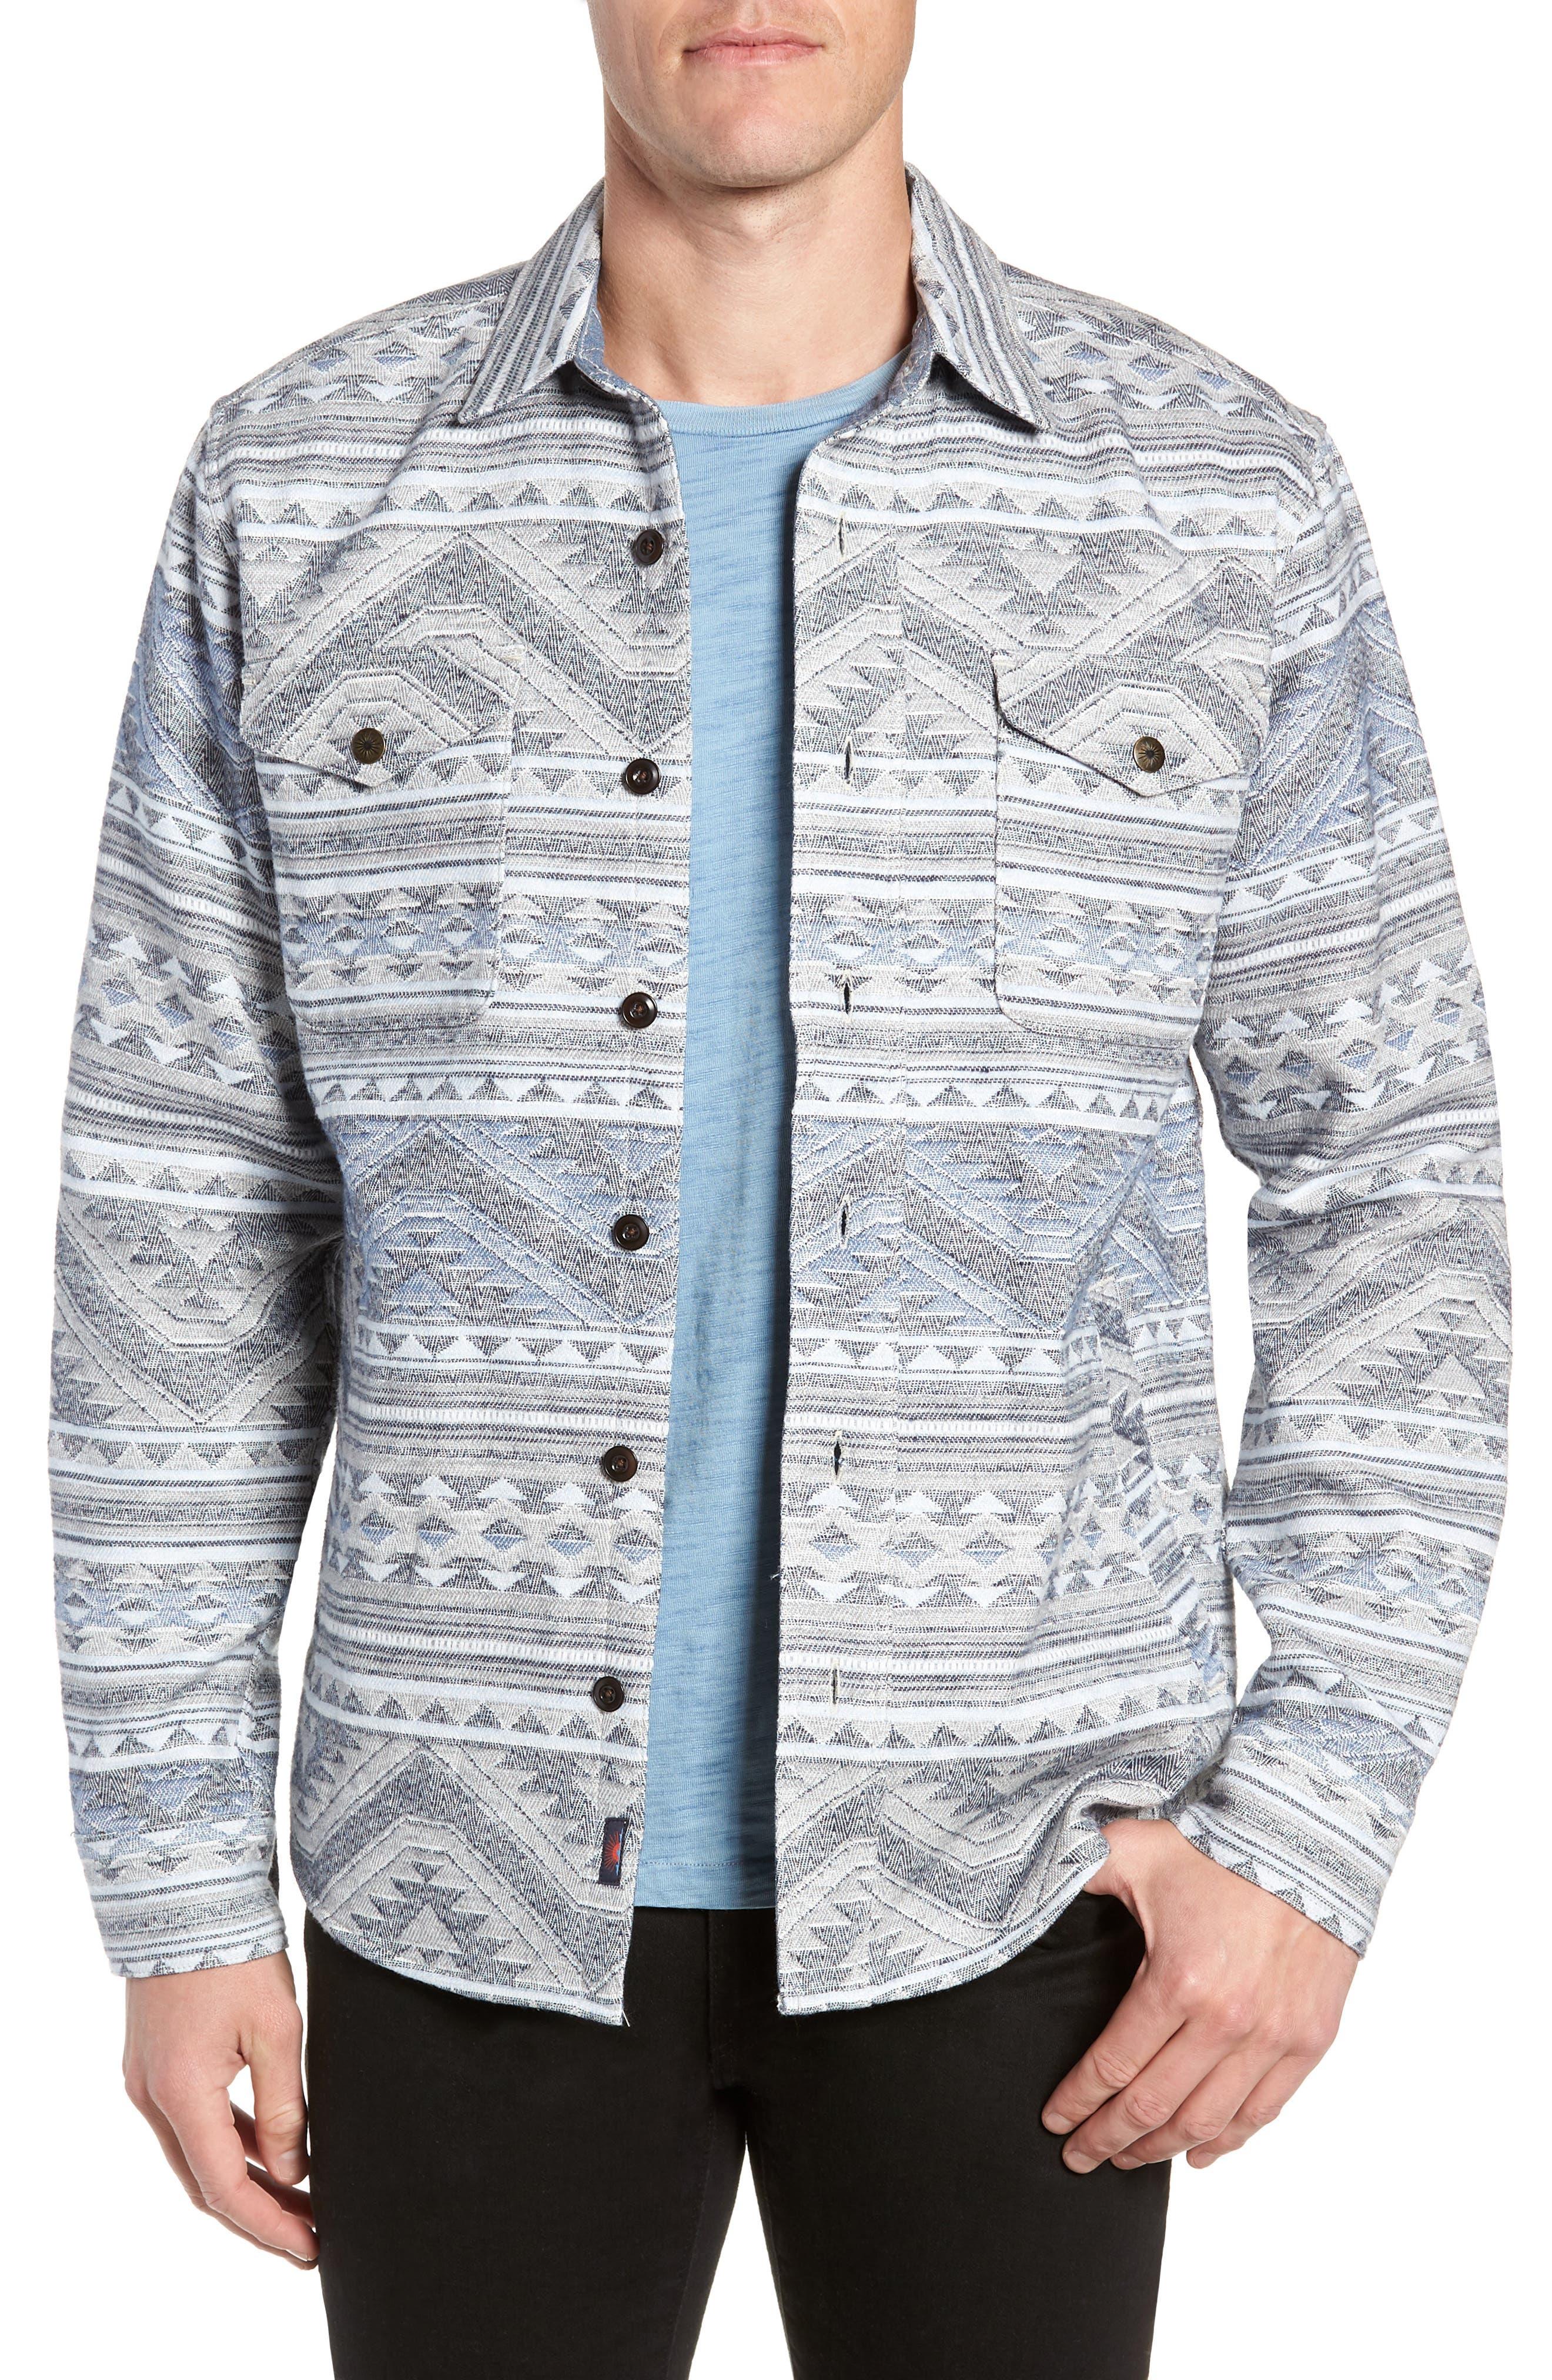 Durango CPO Cotton Work Shirt,                         Main,                         color, TWILIGHT GLACIER